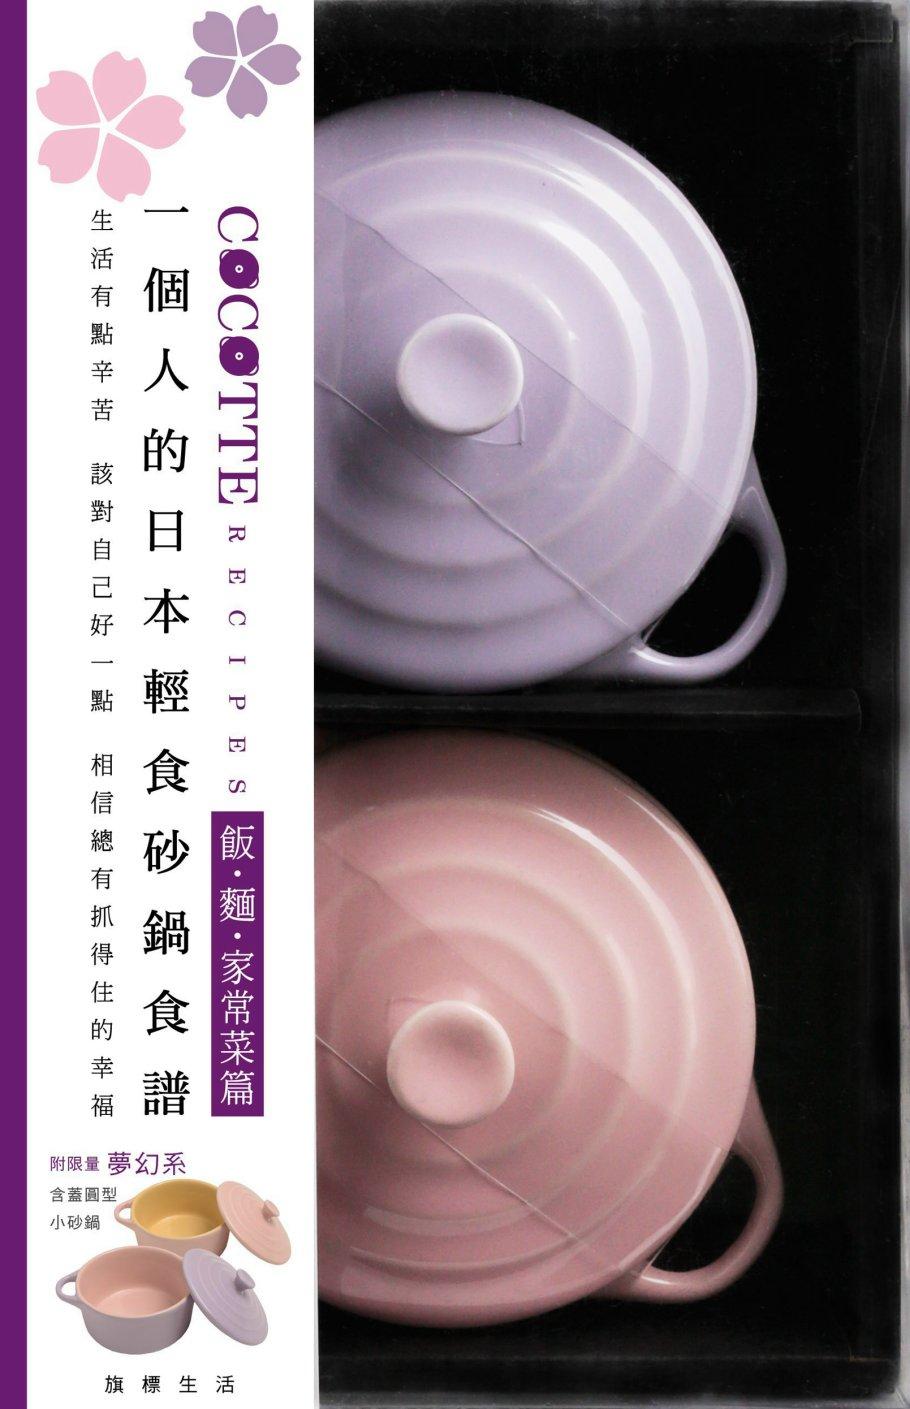 COCOTTE RECIPES 一個人的 輕食砂鍋食譜:飯‧麵‧家常菜篇 v2 附 夢幻系